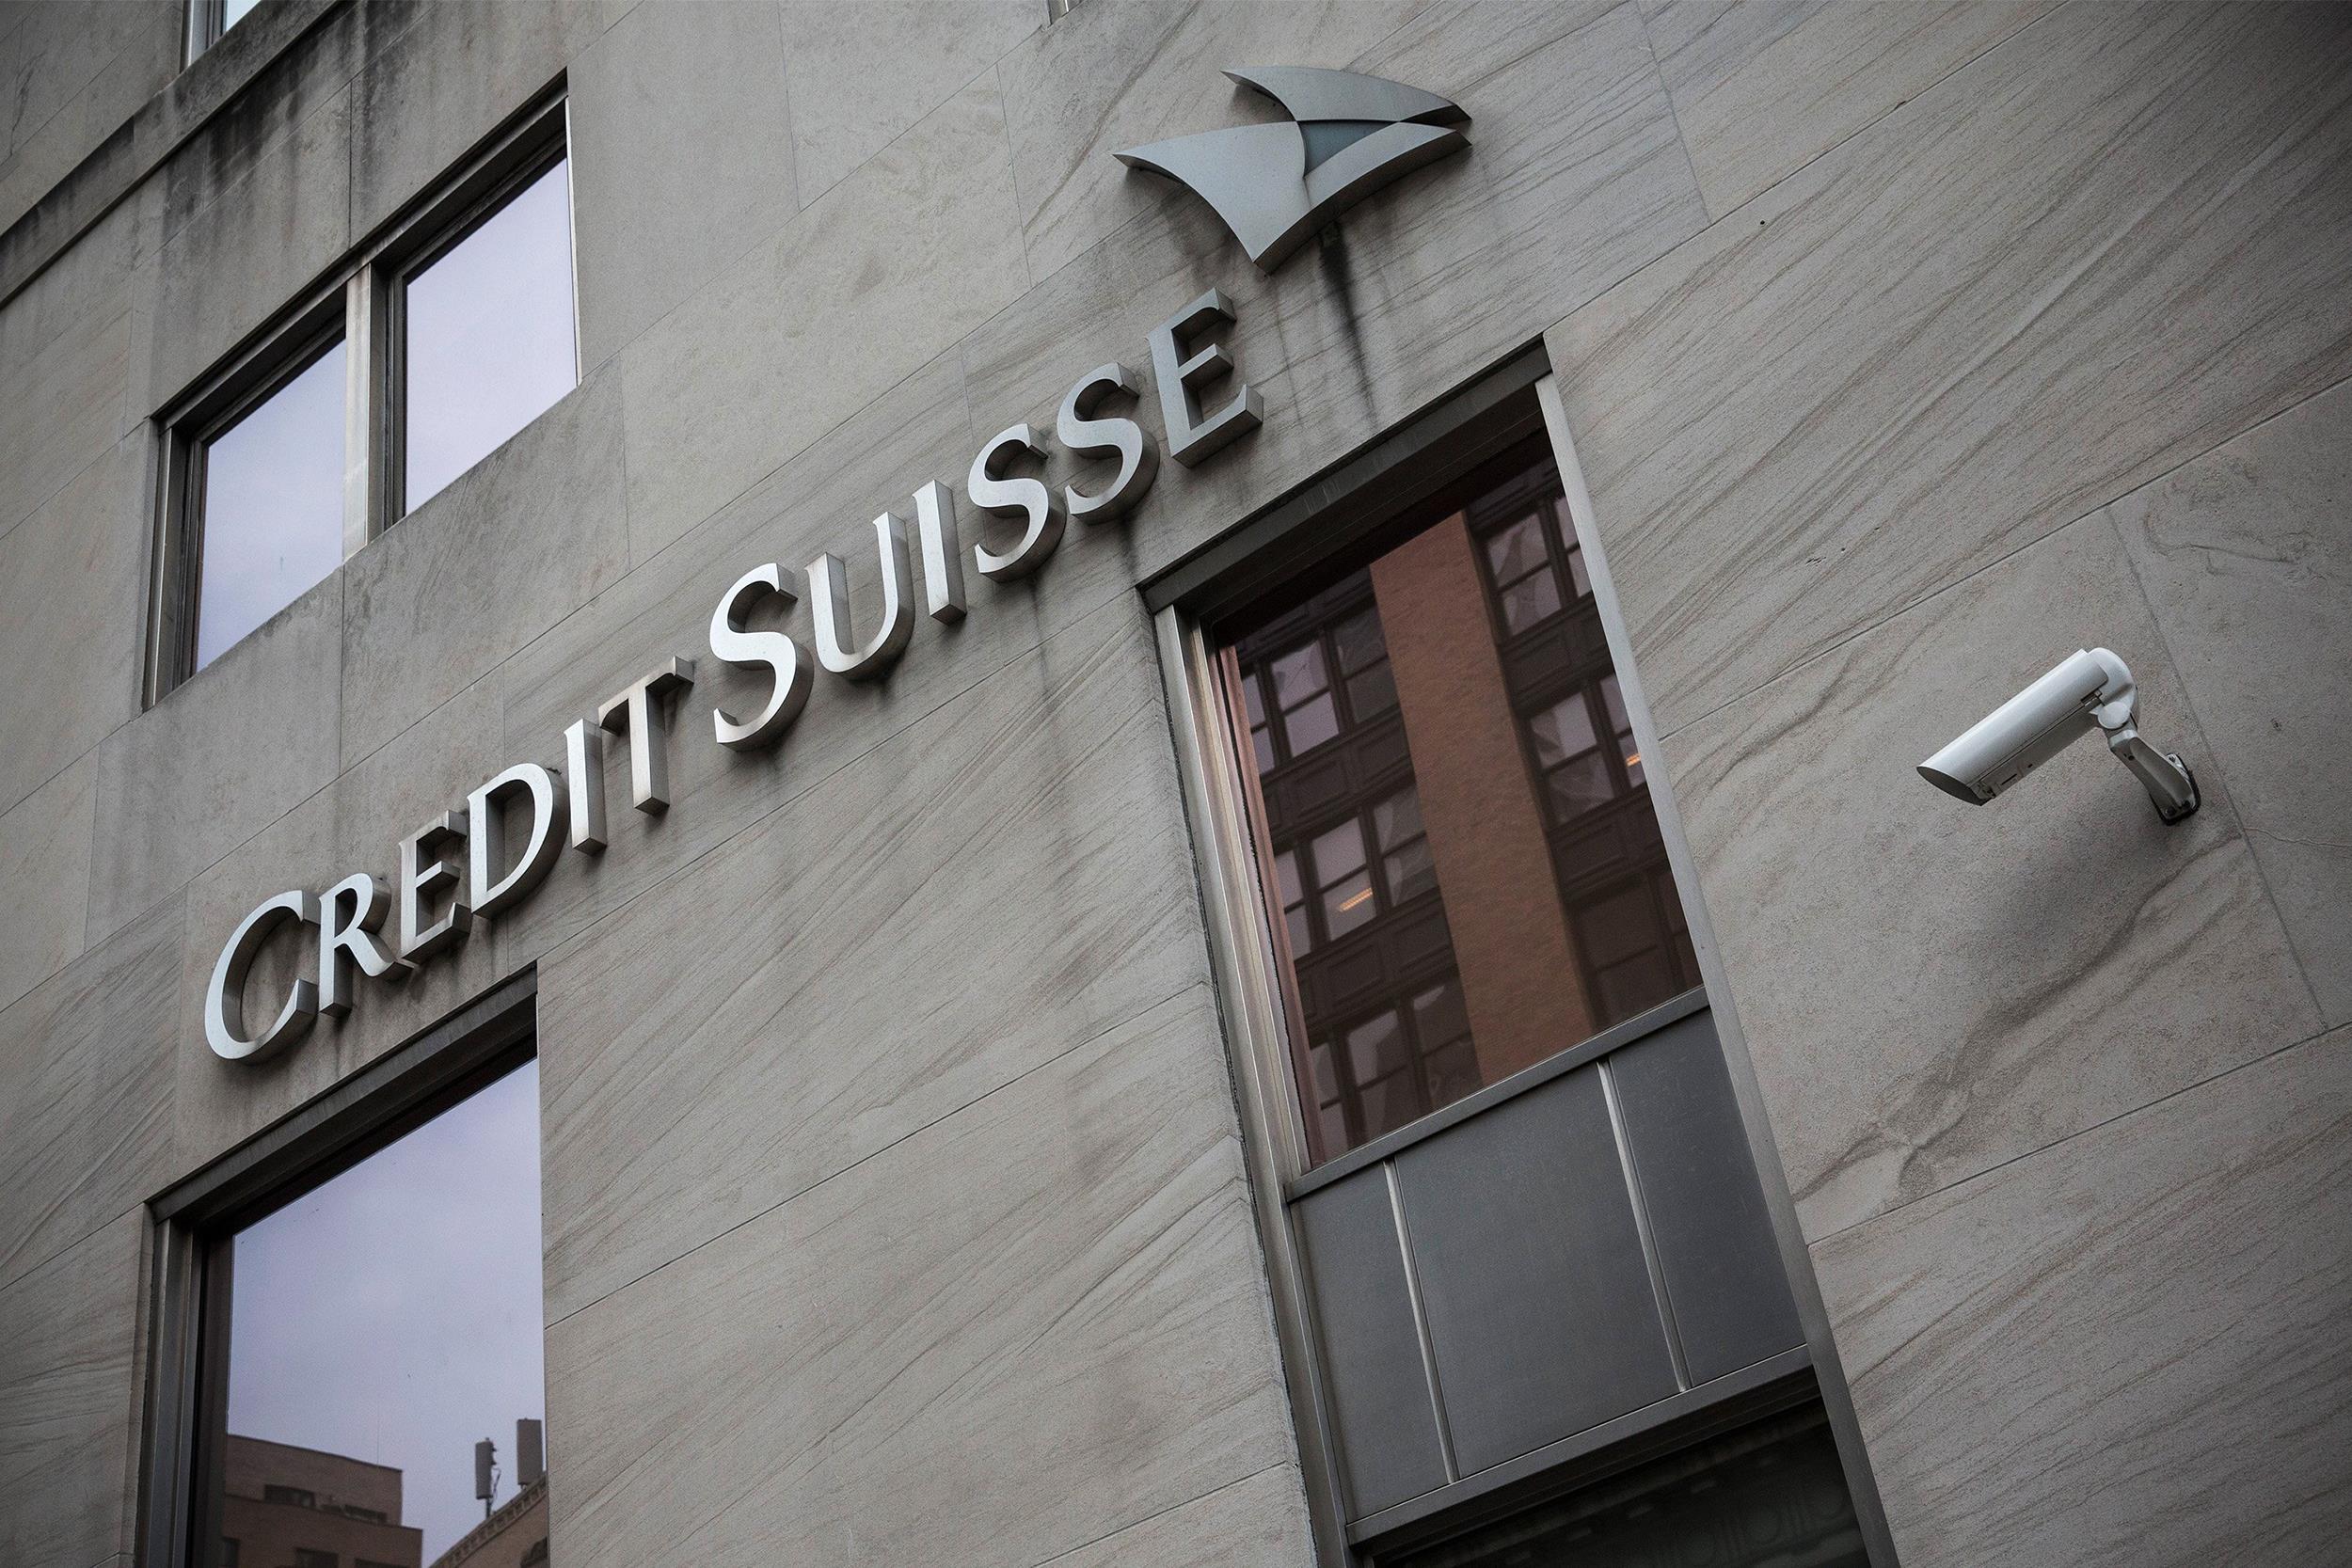 Image: Credit Suisse